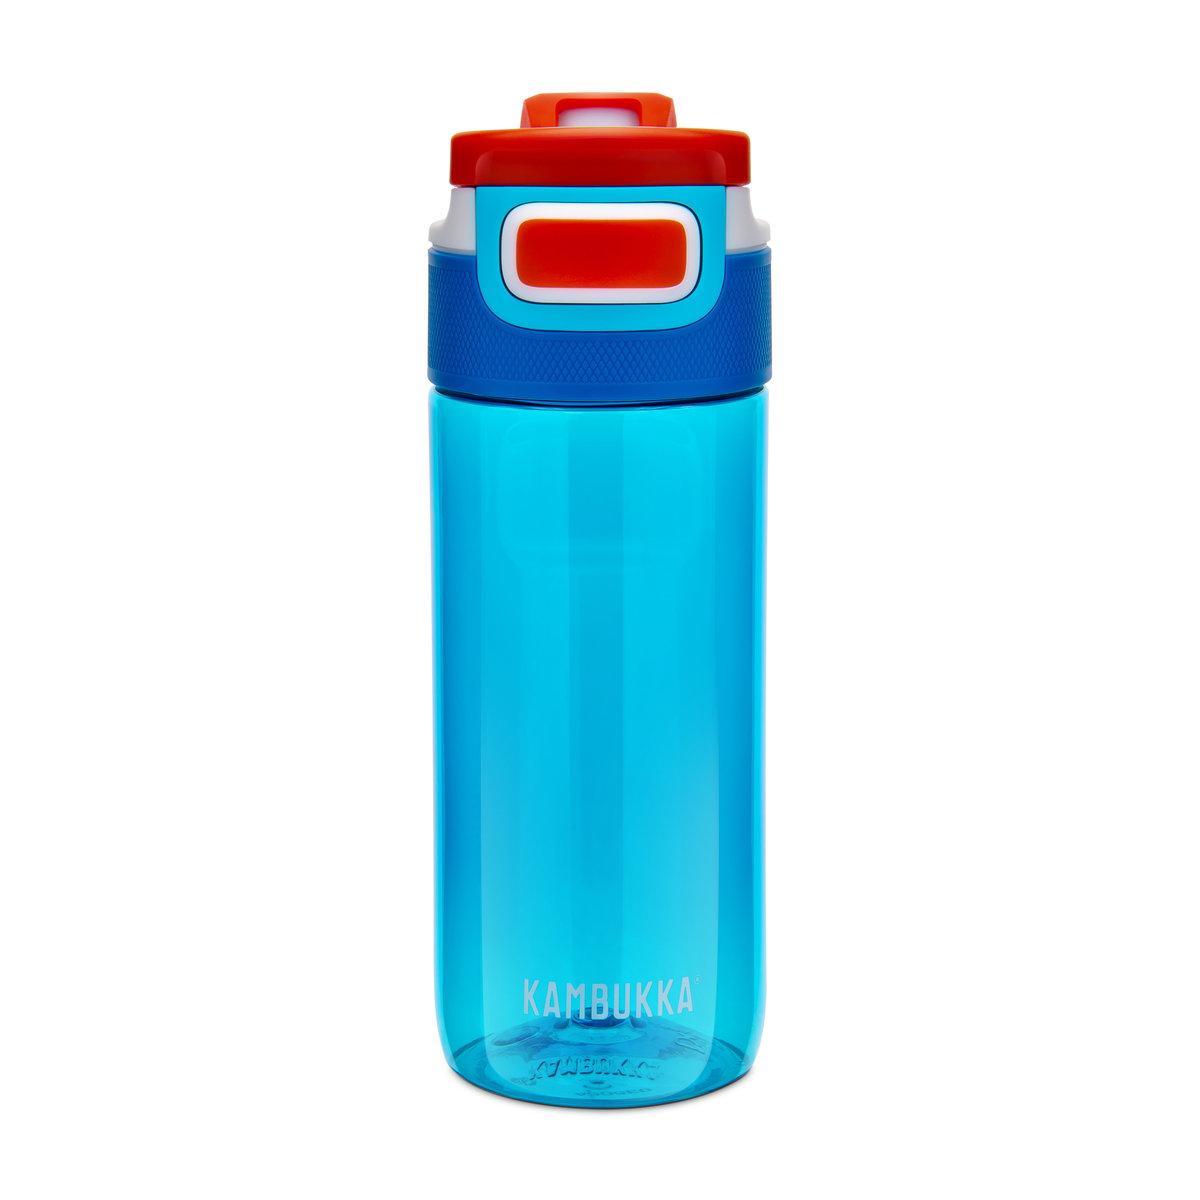 Kambukka Elton 3 in 1 Snap clean Water Bottle (Tritan) 17oz (500ml) - Caribbean